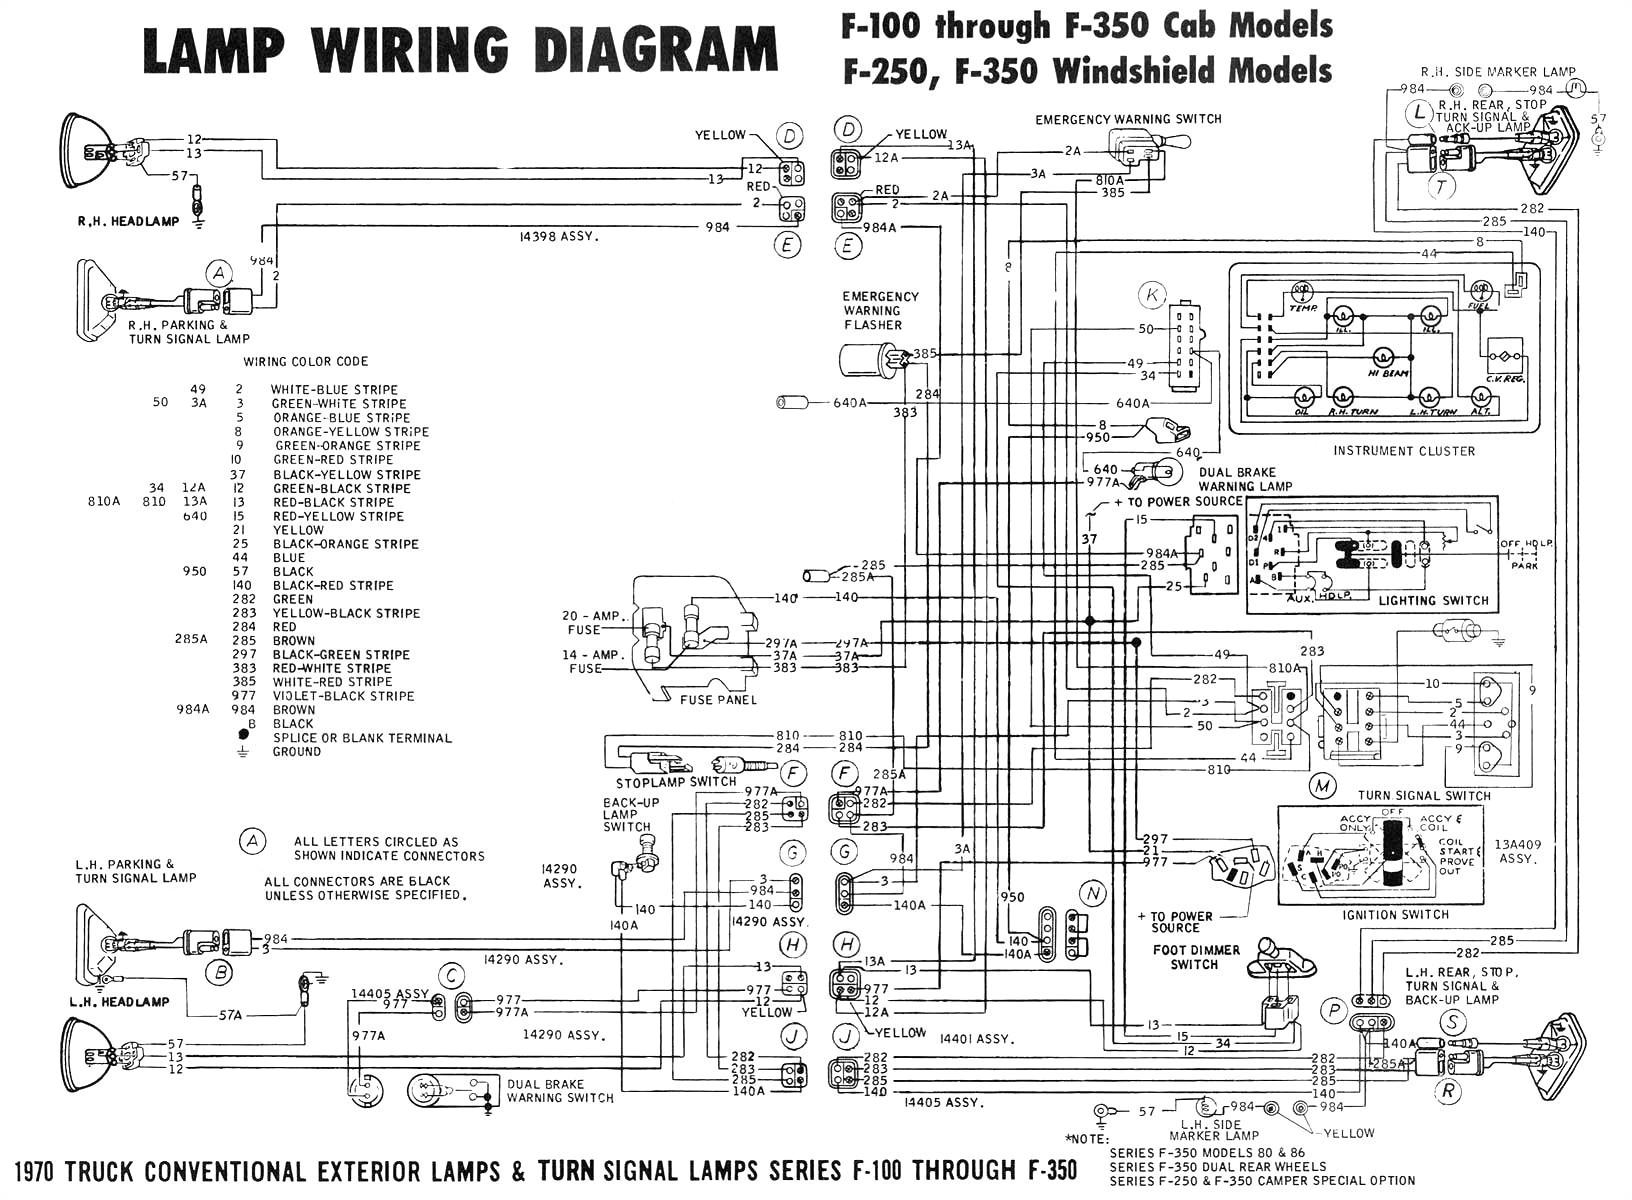 Alpine Cda 9856 Wiring Diagram 1990 Monaco Wiring Diagram Electrical Schematic Wiring Diagram